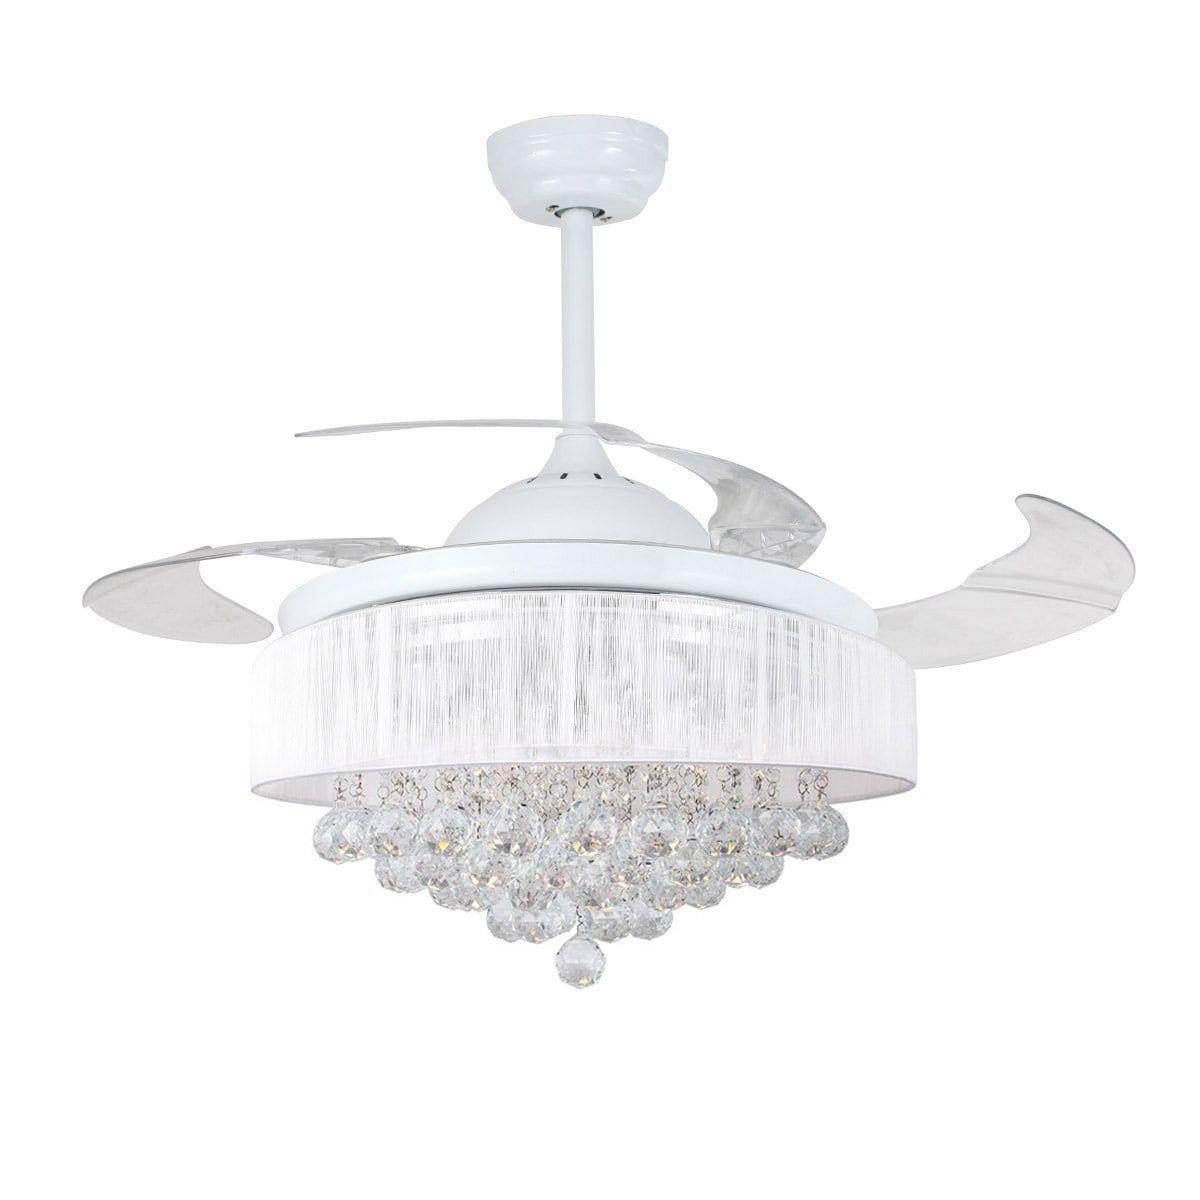 White Chandelier Ceiling Fan: Bedding, Furniture, Electronics, Jewelry